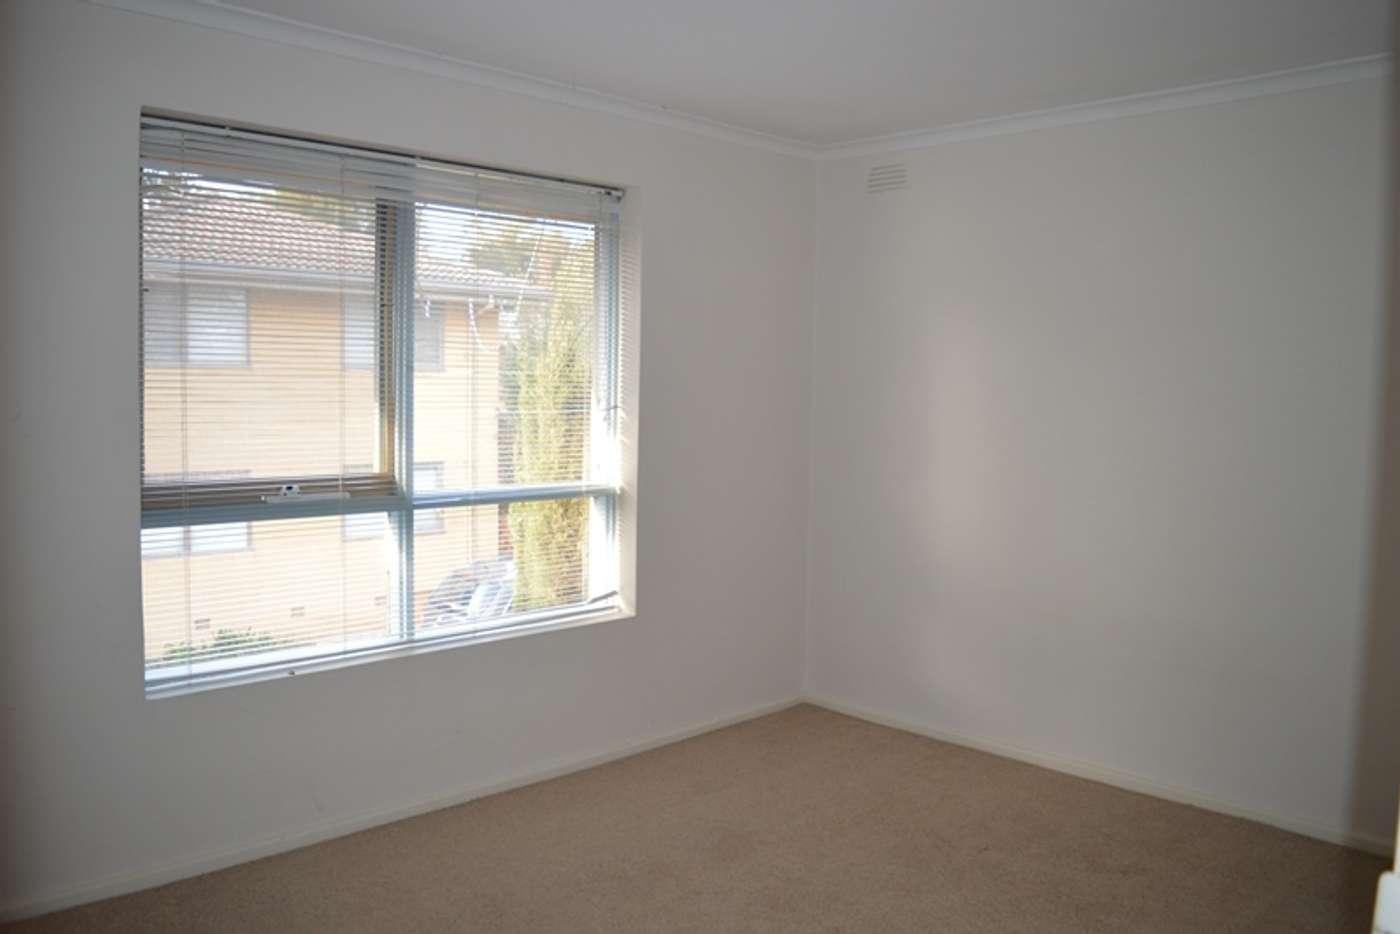 Seventh view of Homely unit listing, 7/4 Glebe Avenue, Cheltenham VIC 3192